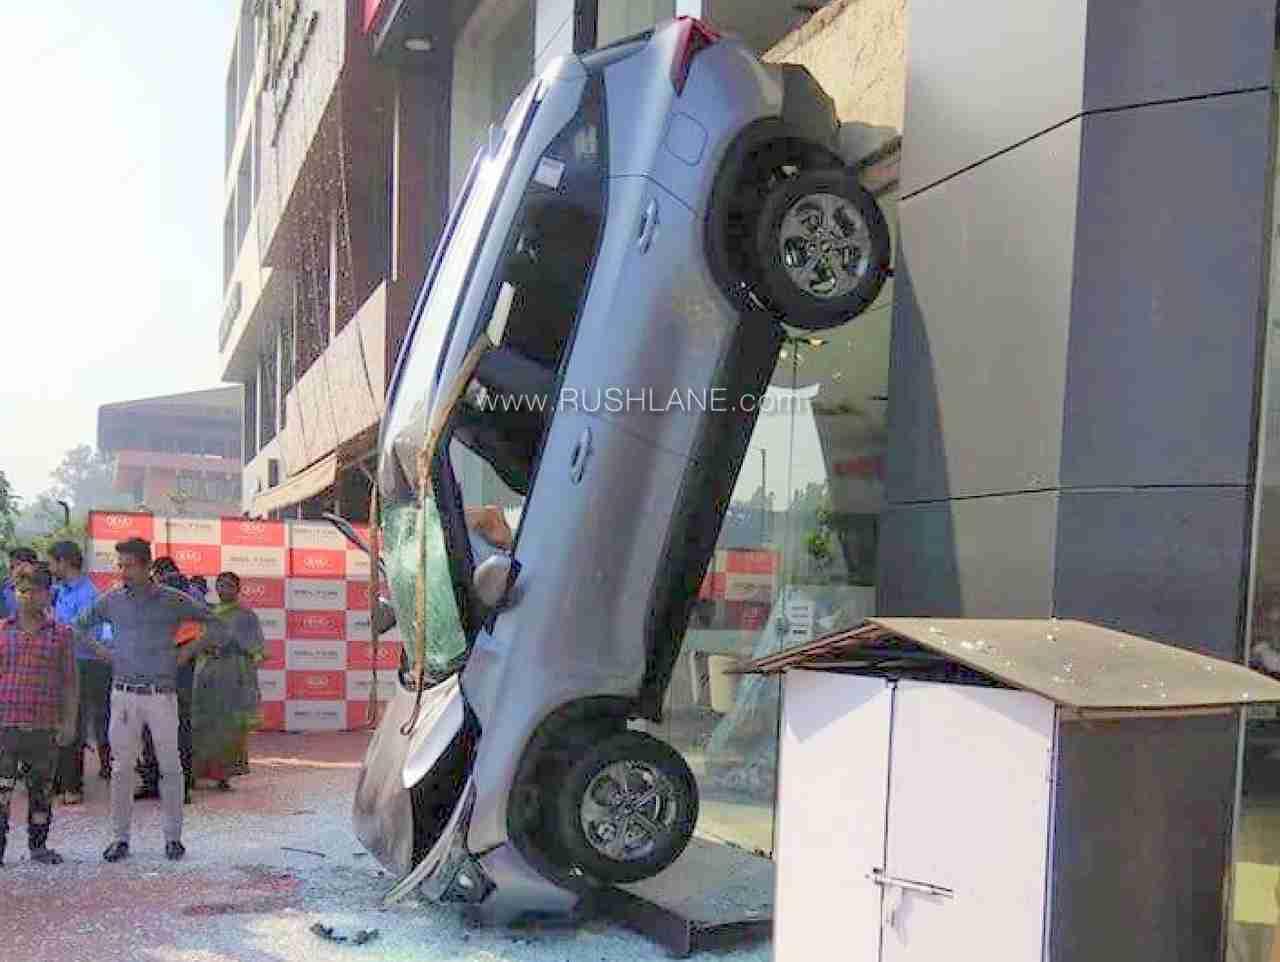 Kia Seltos falls from 1st floor